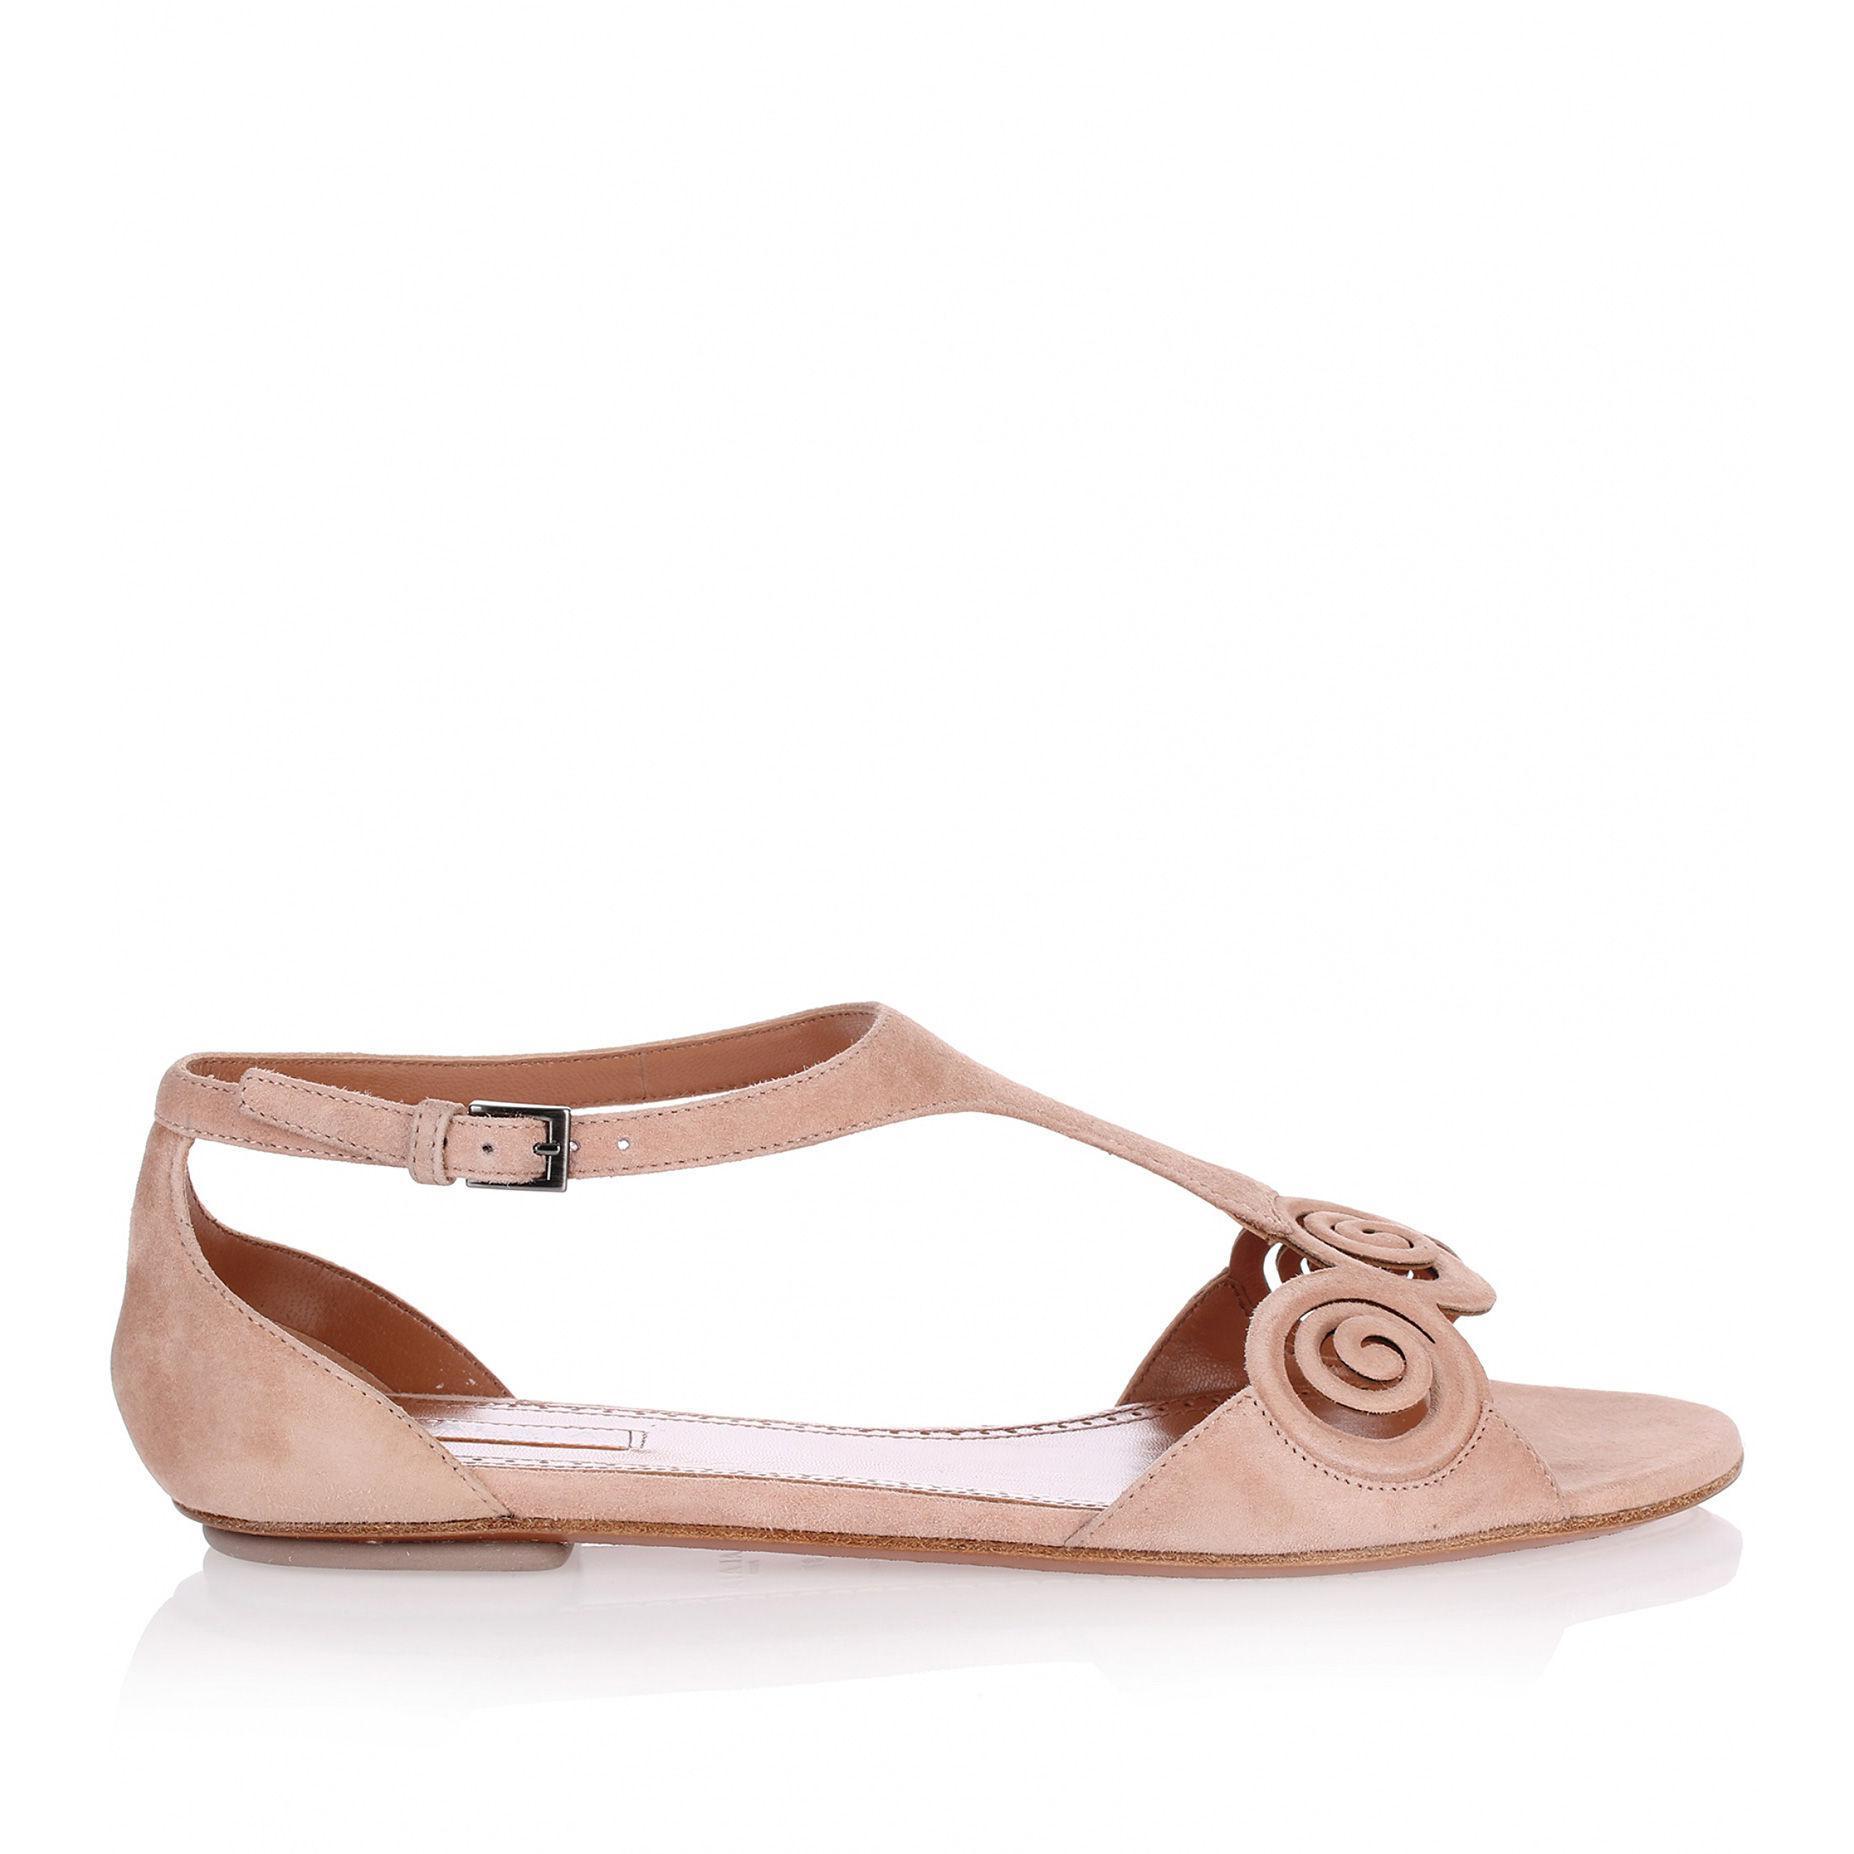 0b2cf3b544420 Alaïa - Multicolor Nude Suede Flat Sandal Us - Lyst. View fullscreen